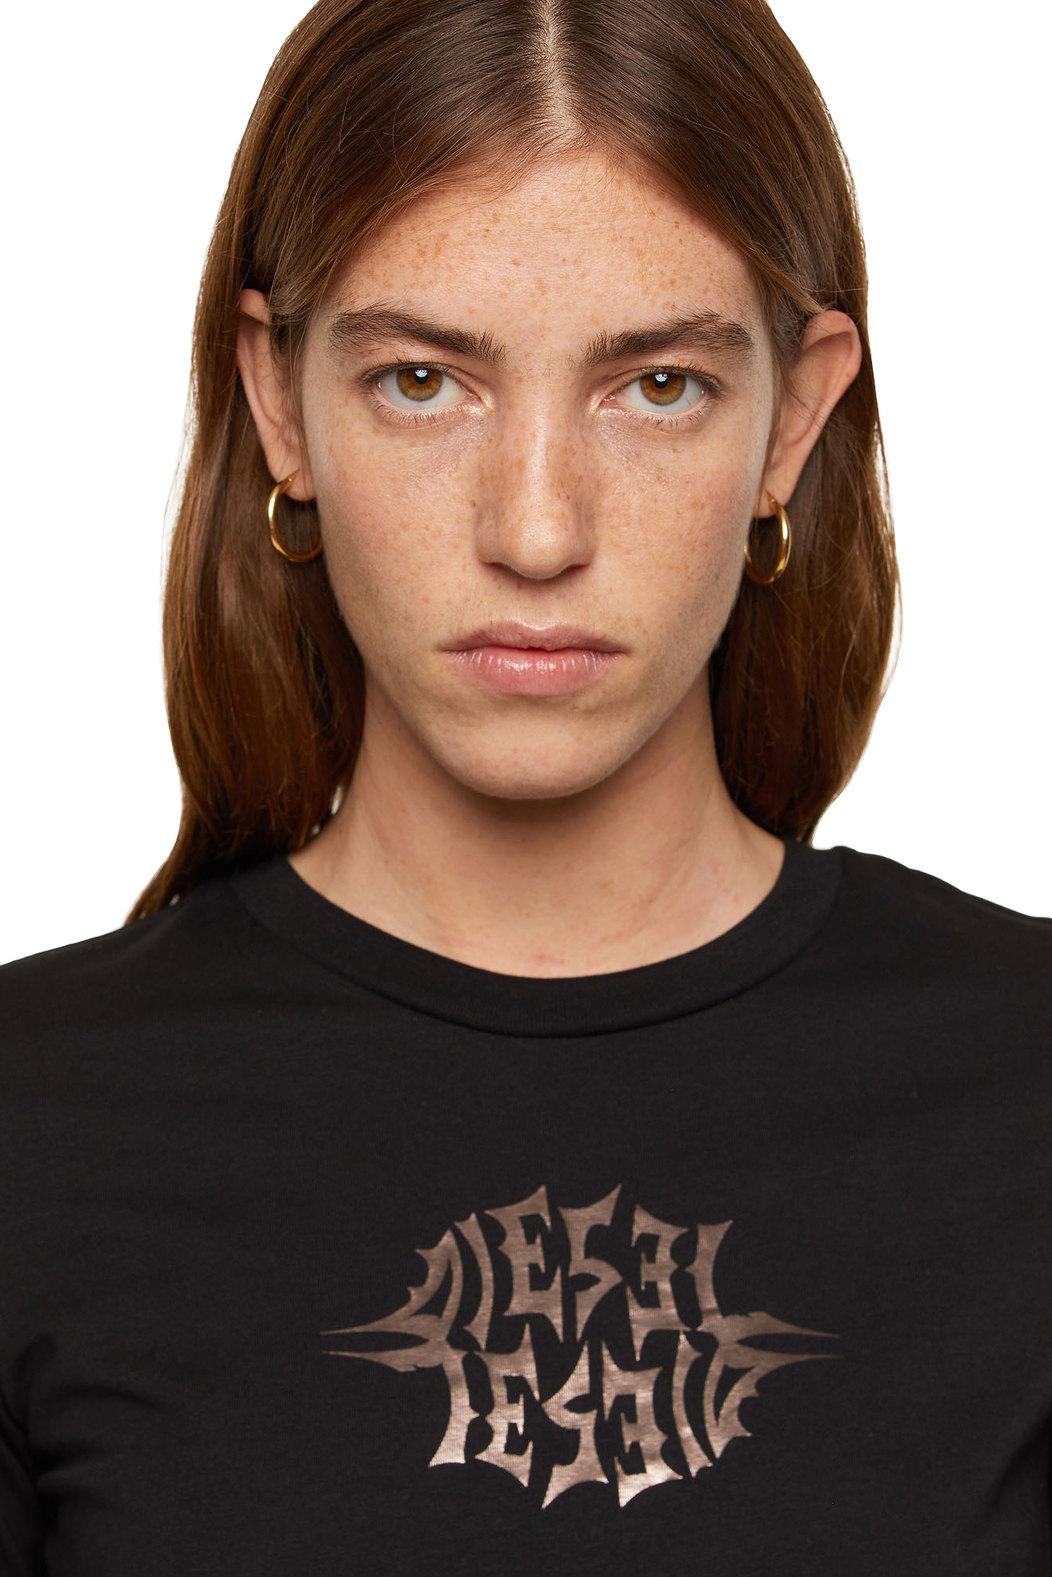 T-shirt with metallic foil print